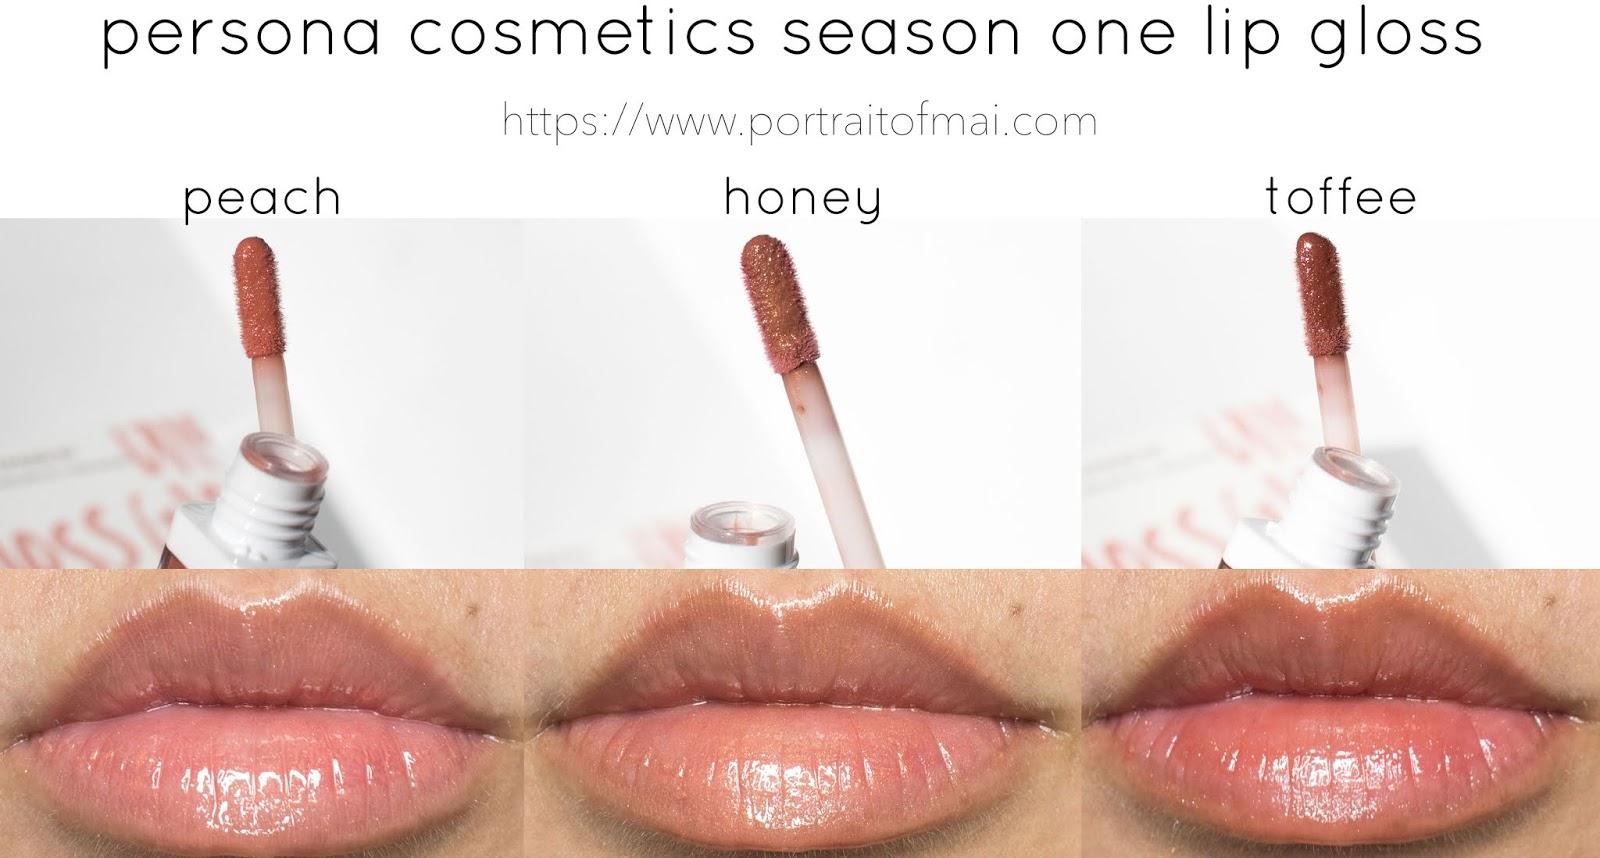 Persona Cosmetics Season One Lip Gloss Swatches and Closeups